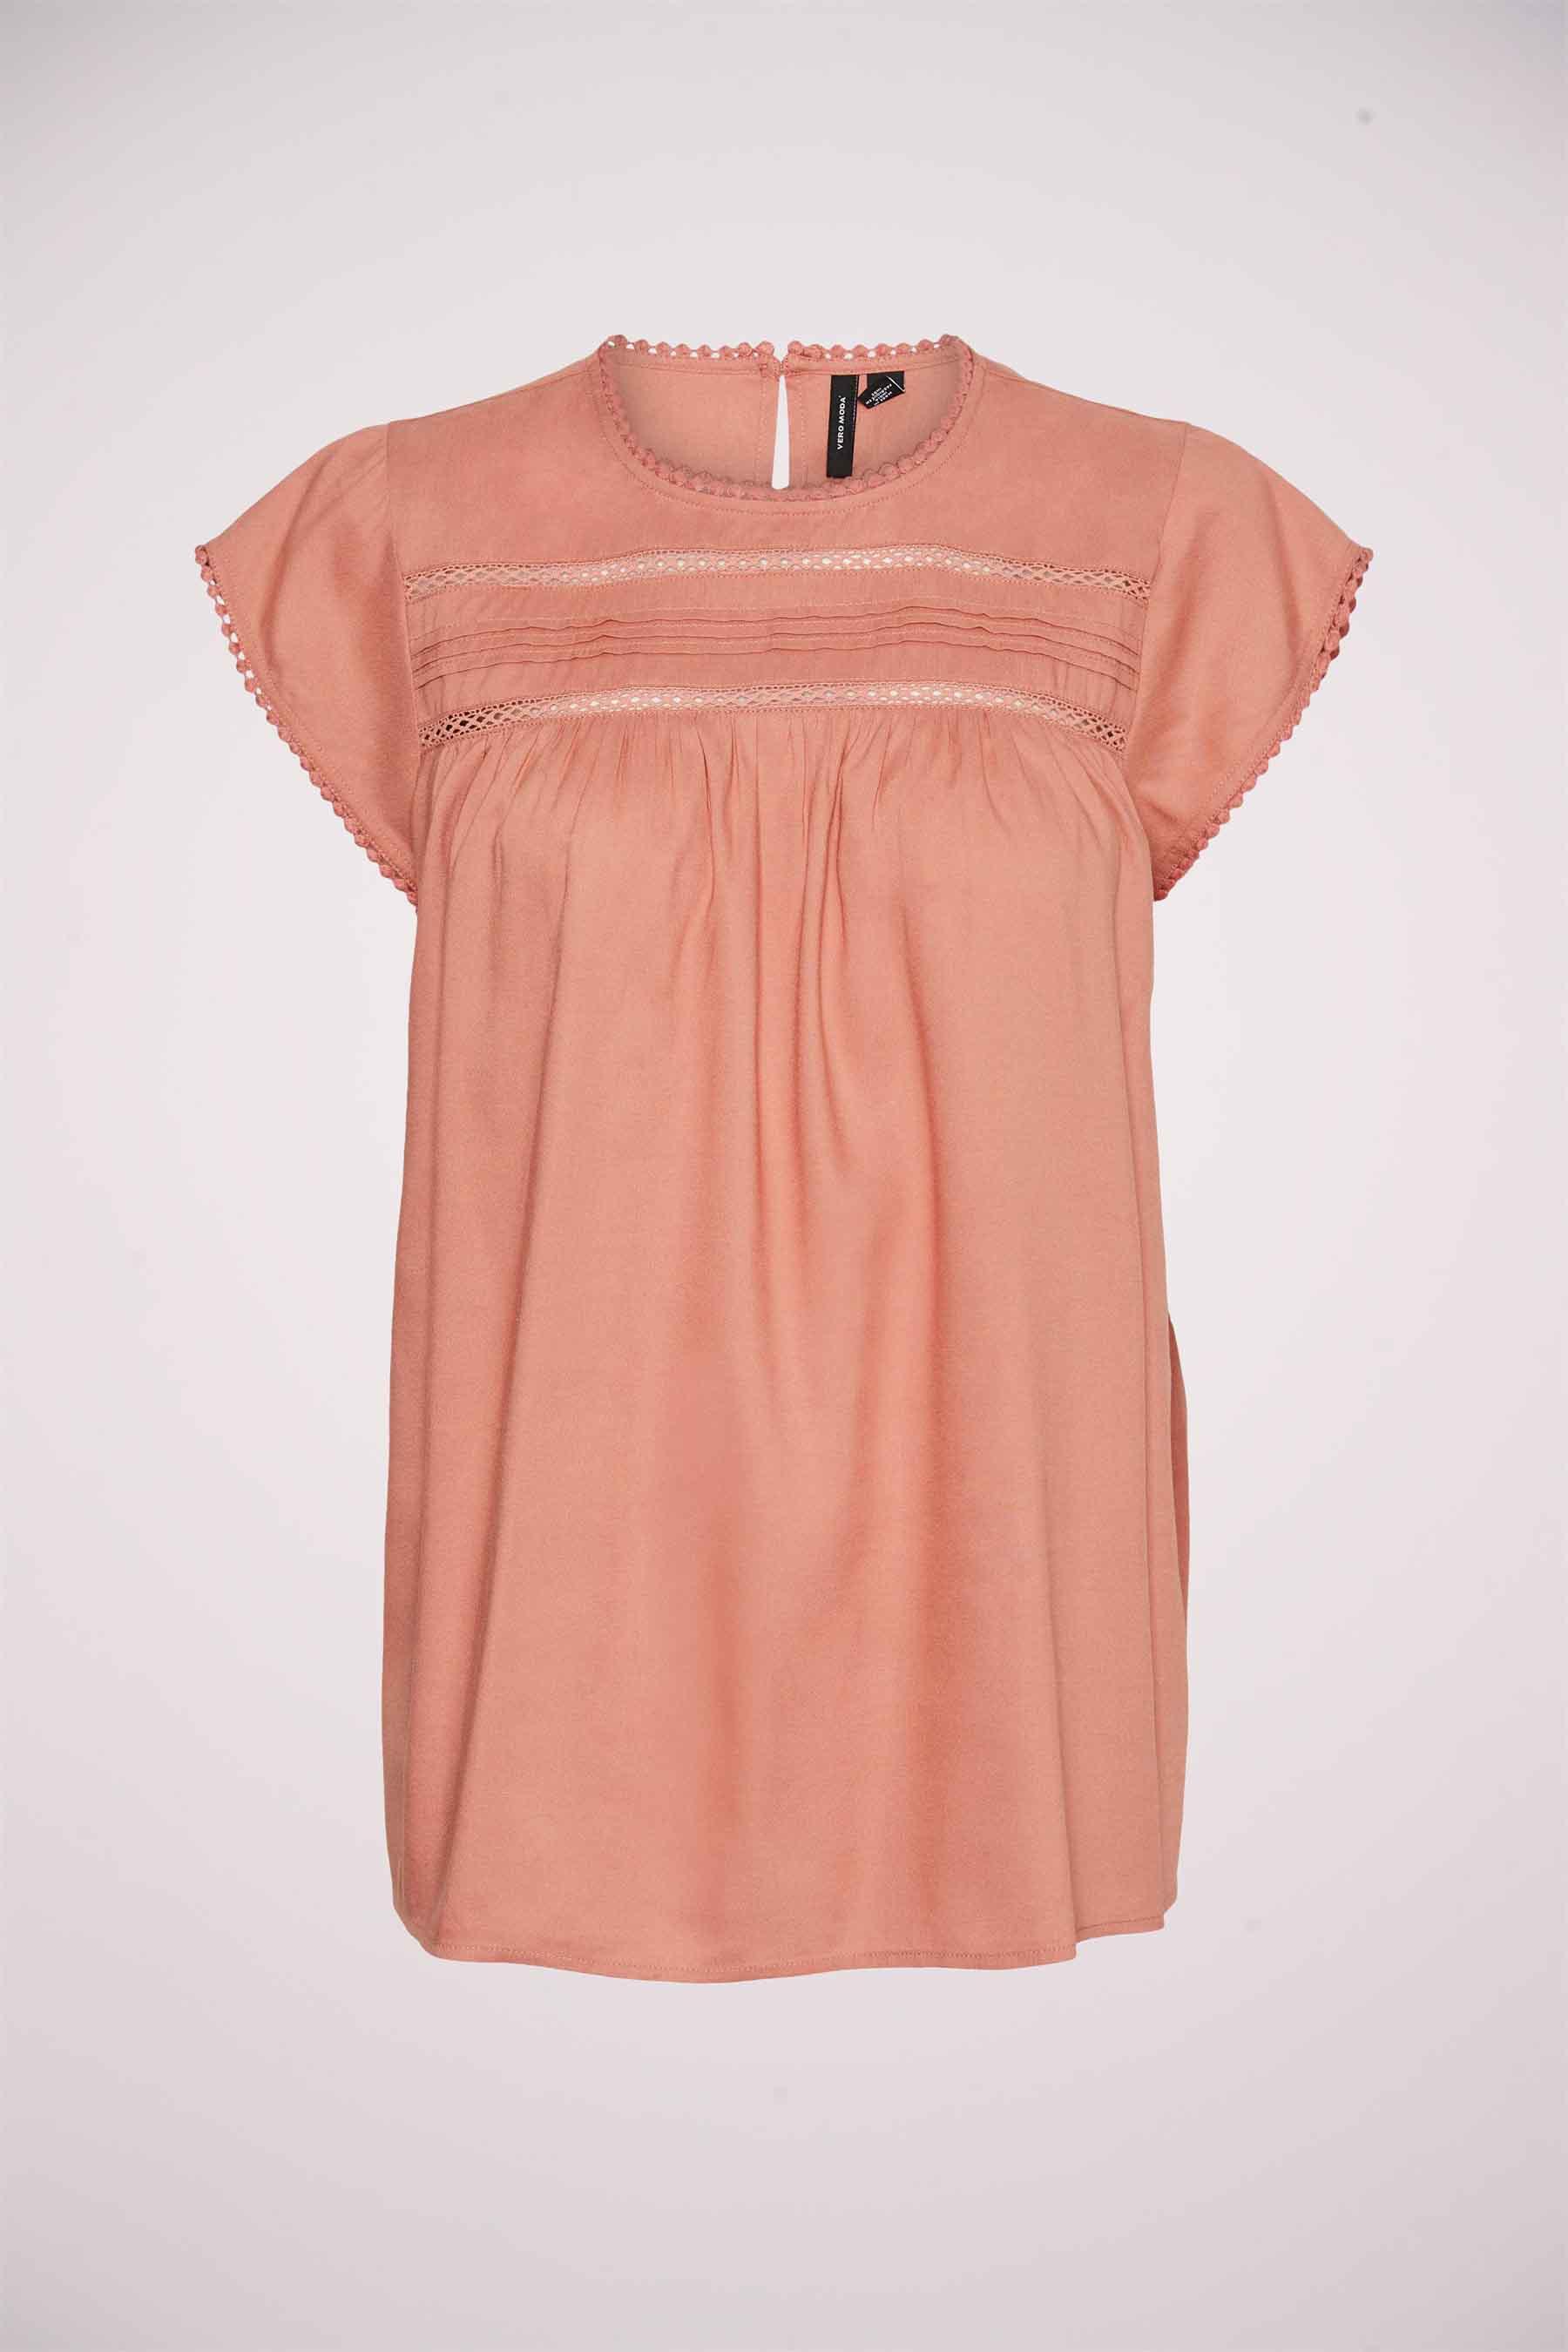 Vero Moda® Blouse korte mouwen, Roze, Dames, Maat: L/M/S/XS